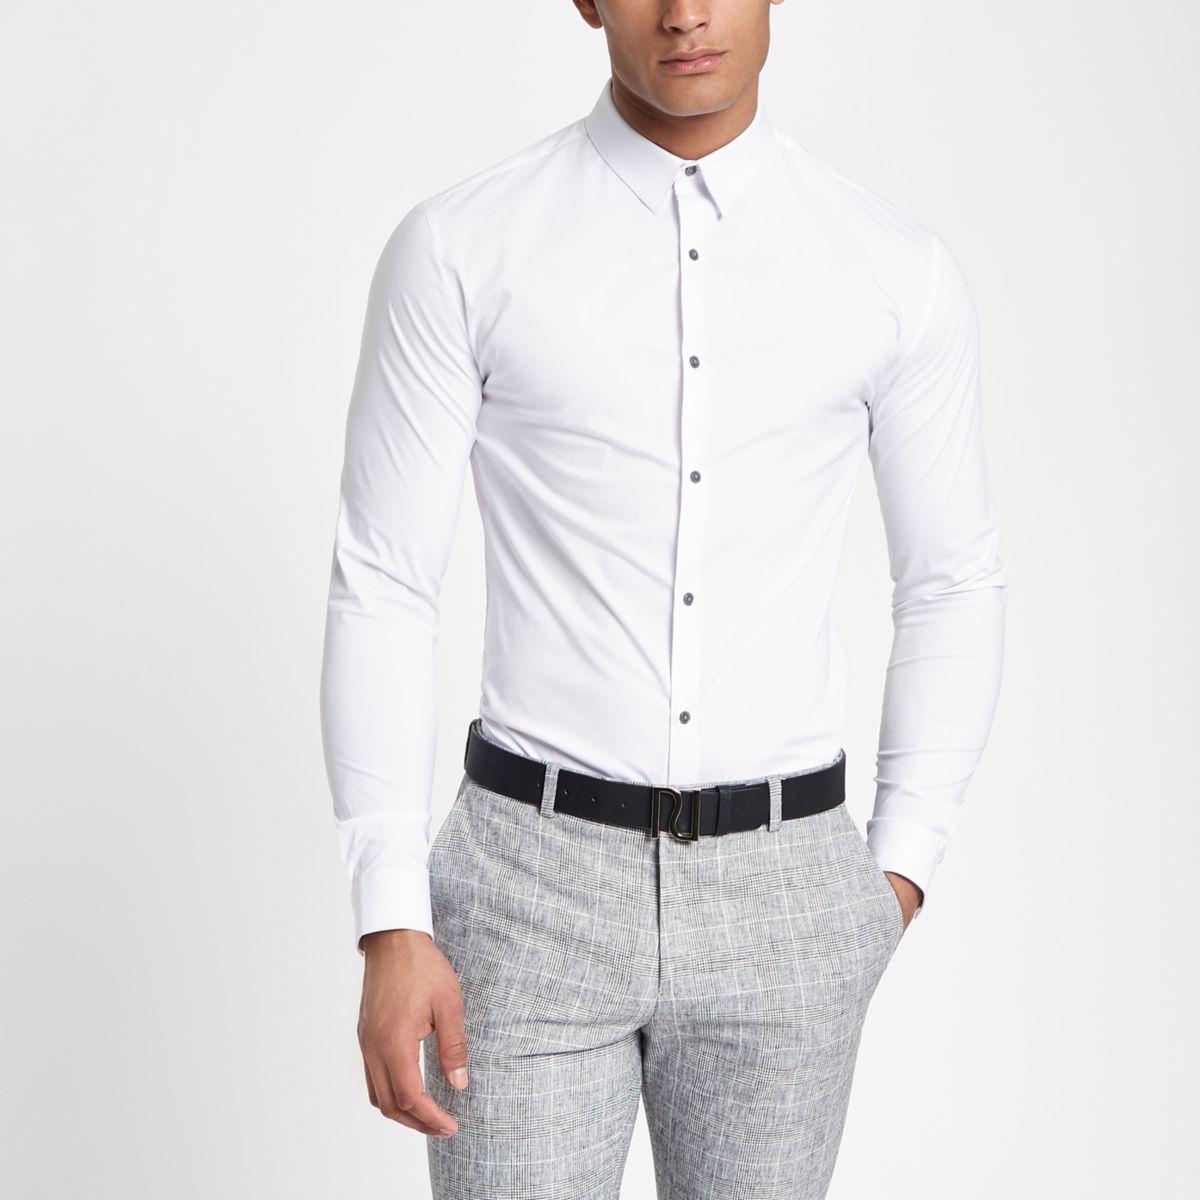 White poplin muscle fit long sleeve shirt